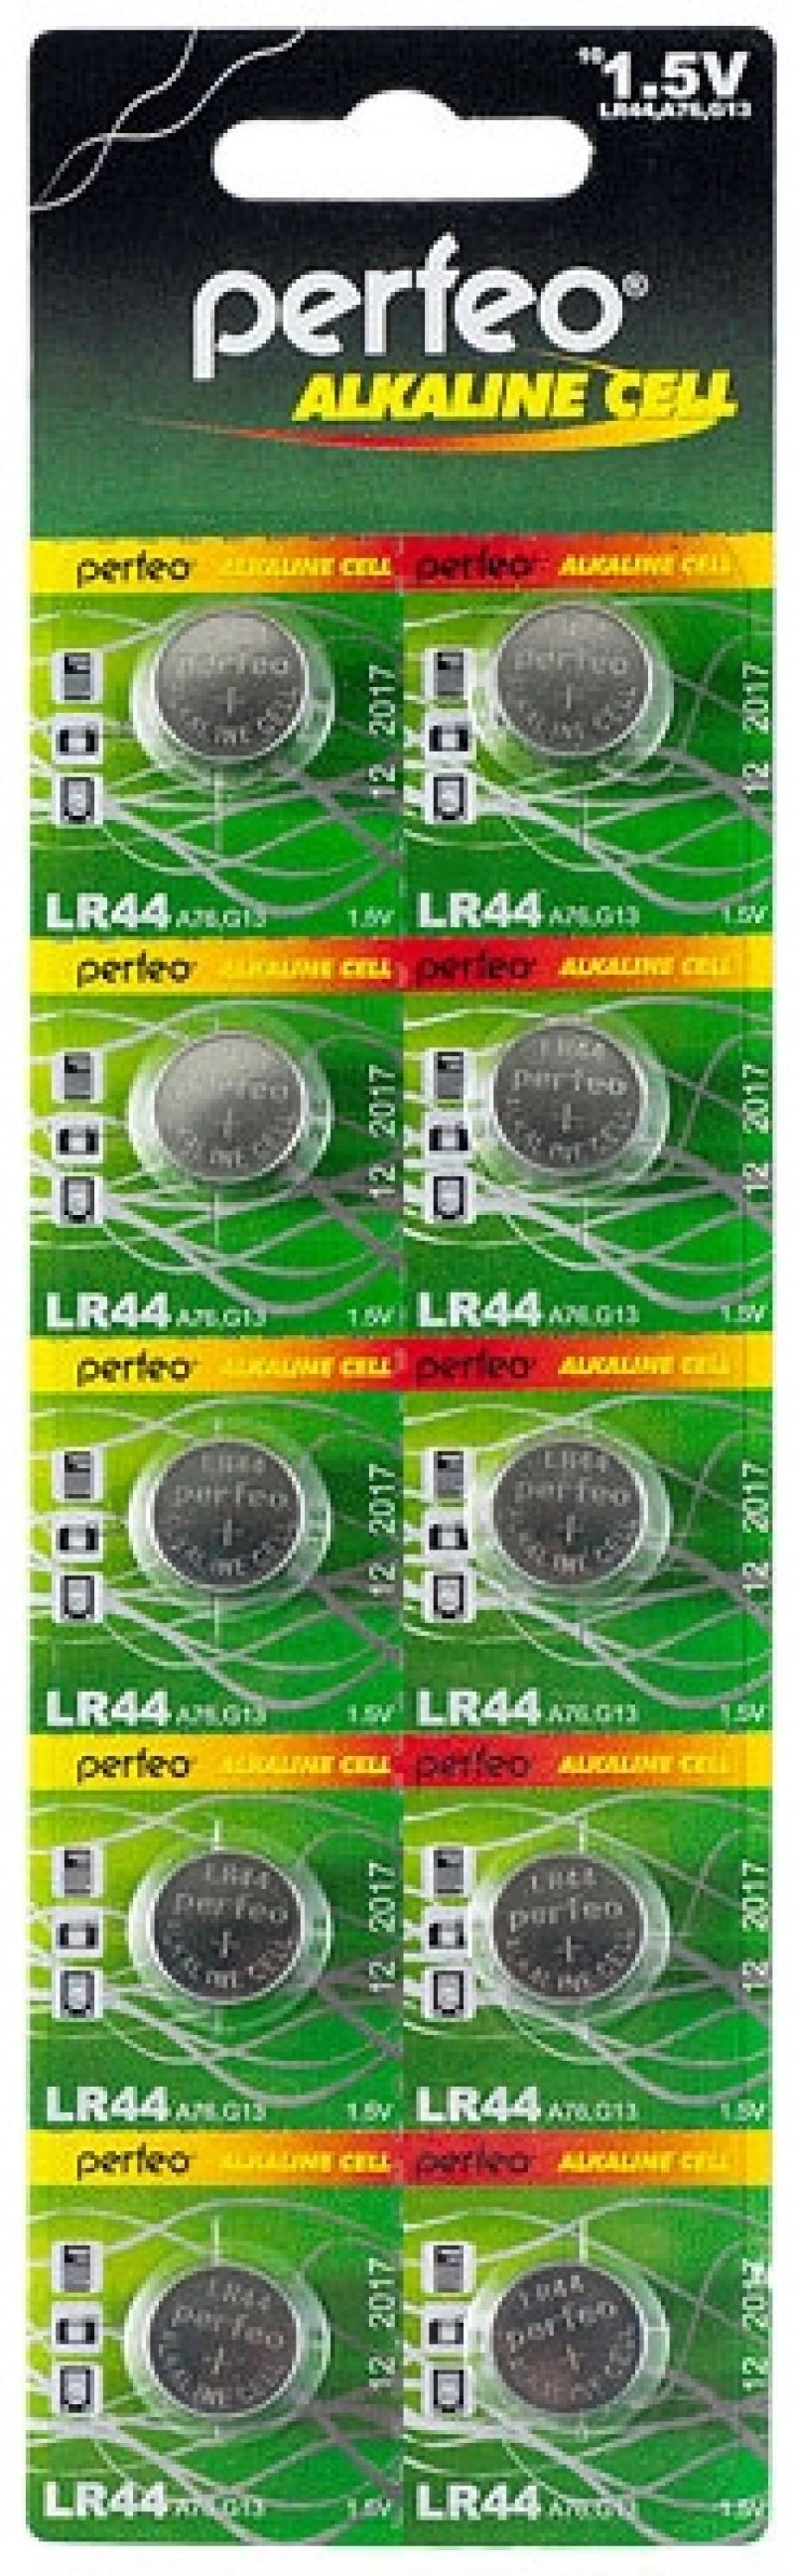 Батарейки Perfeo LR44/10BL Alkaline Cell 357A AG13 LR44 10 шт